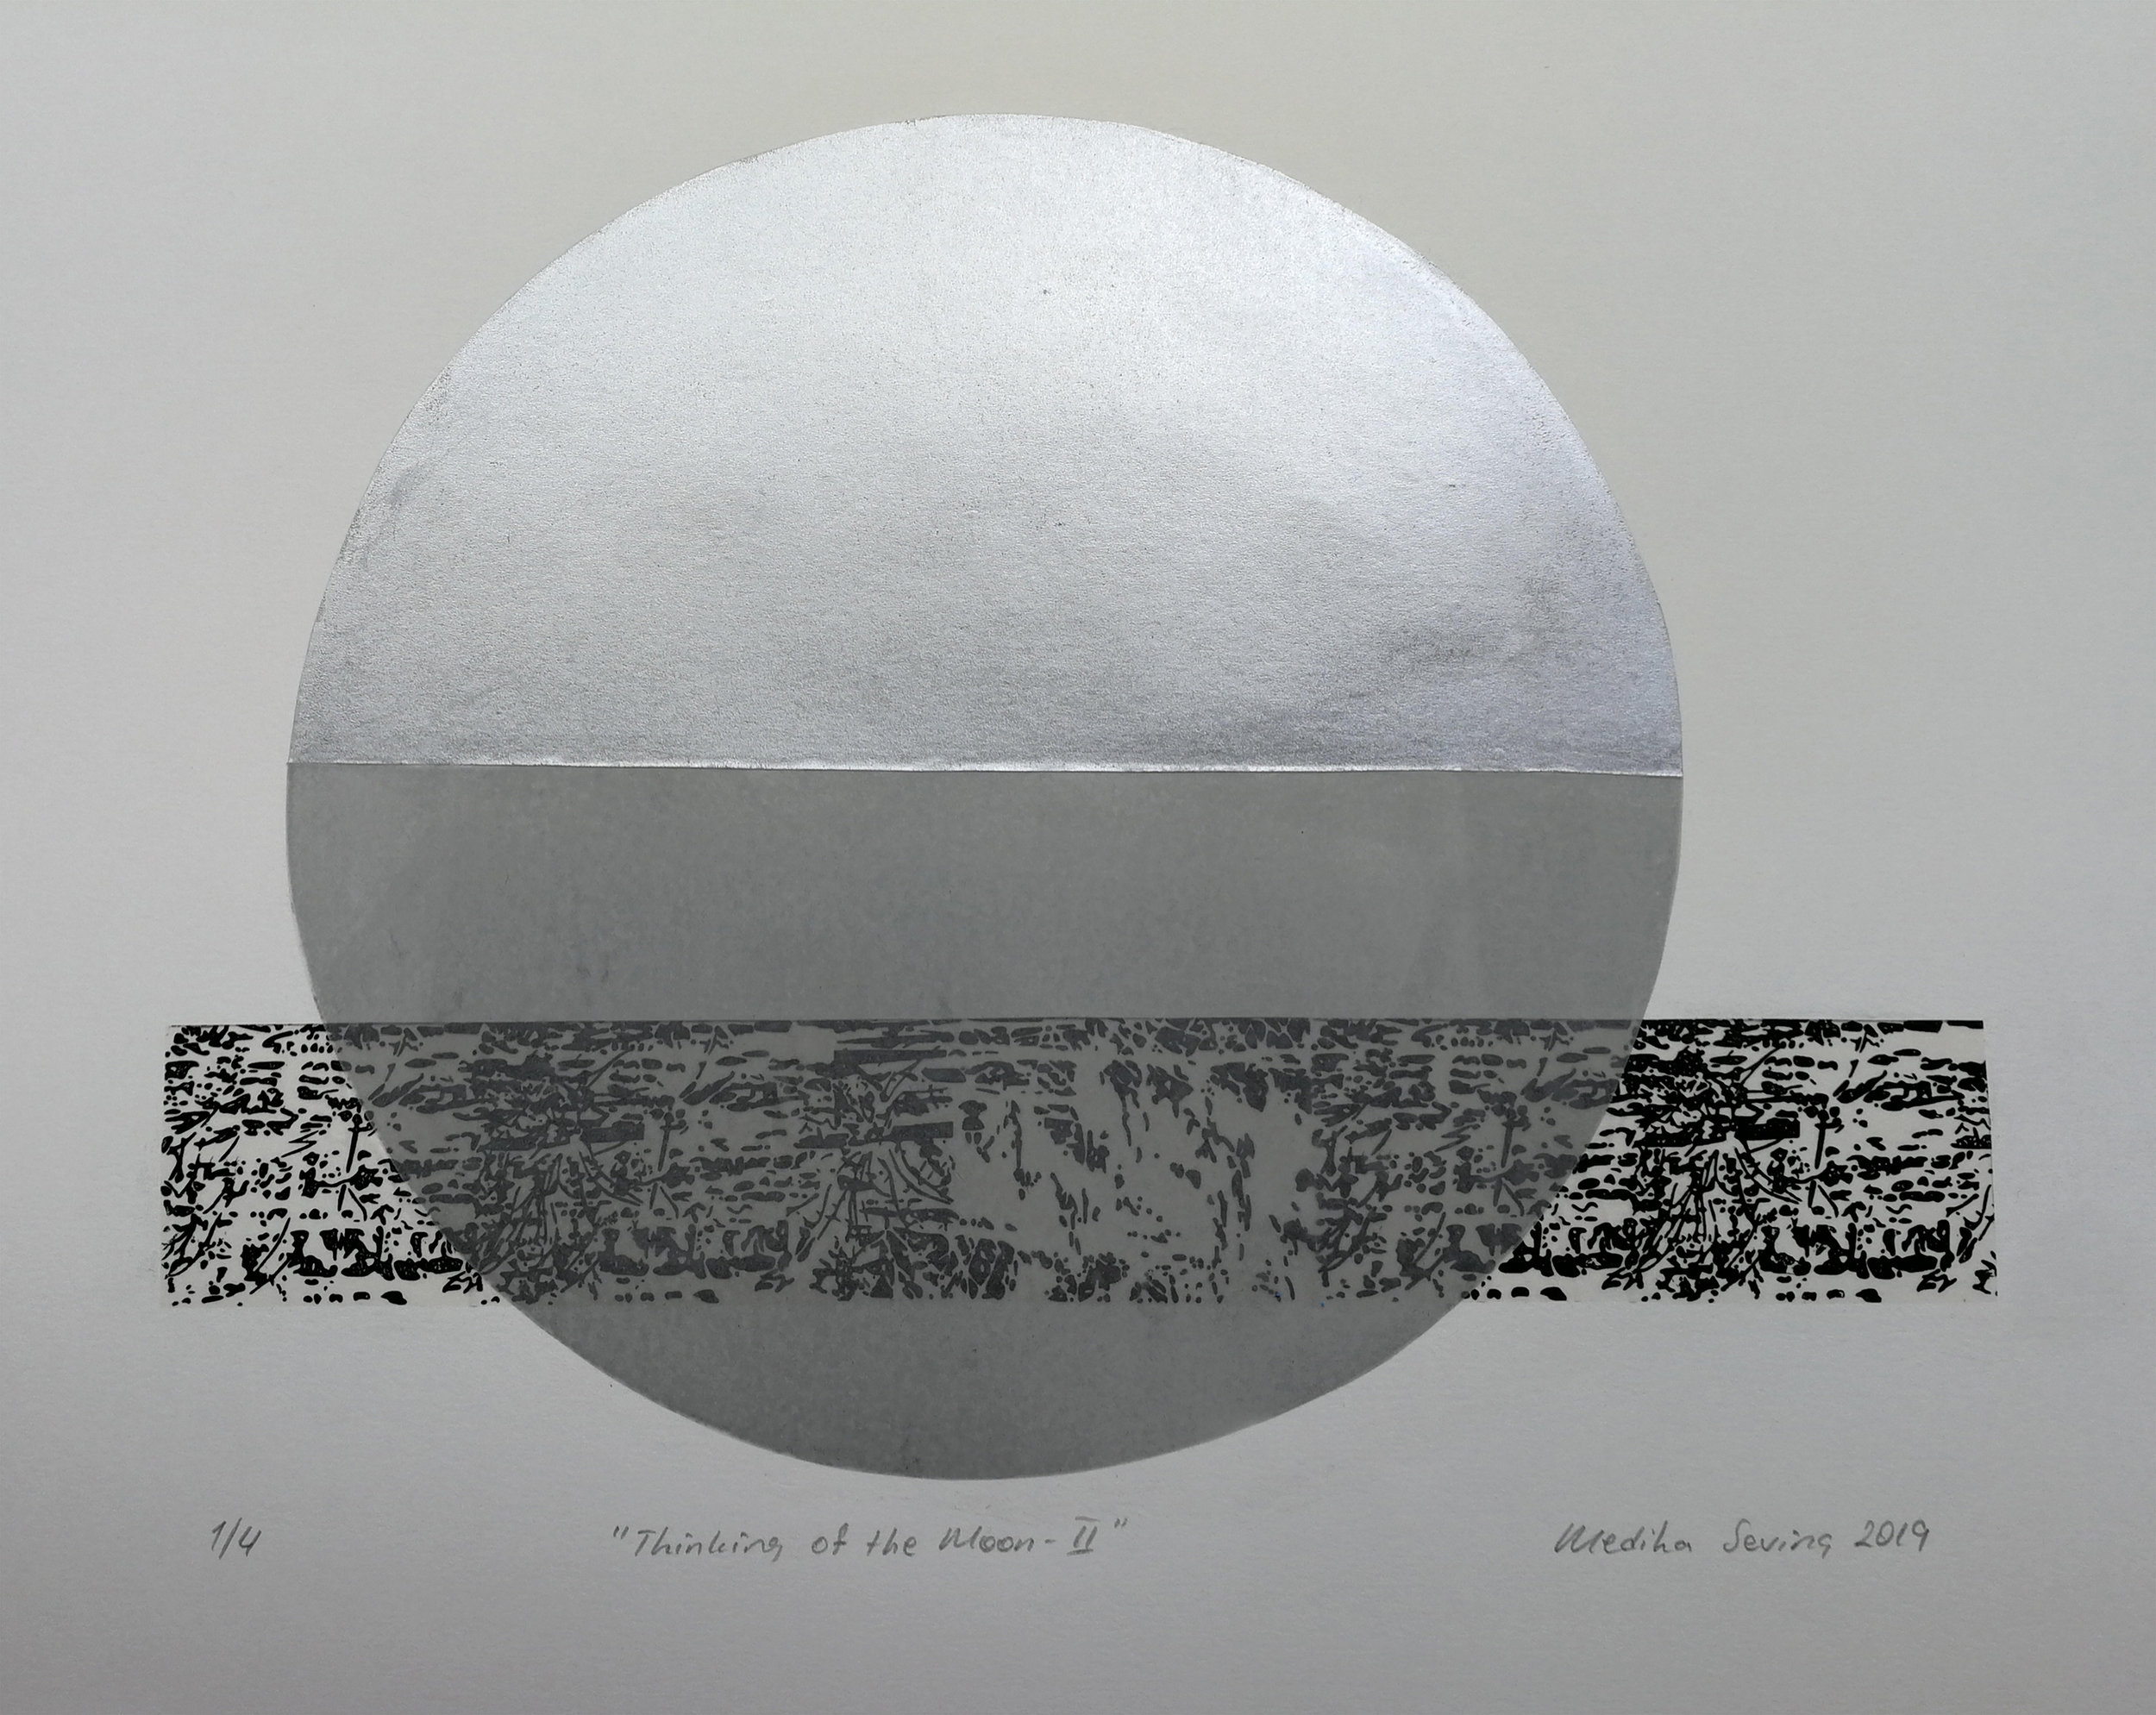 2. Mediha Sevinc, Thinking of the Moon- II, 32,5x25,3cm, 2019.jpg